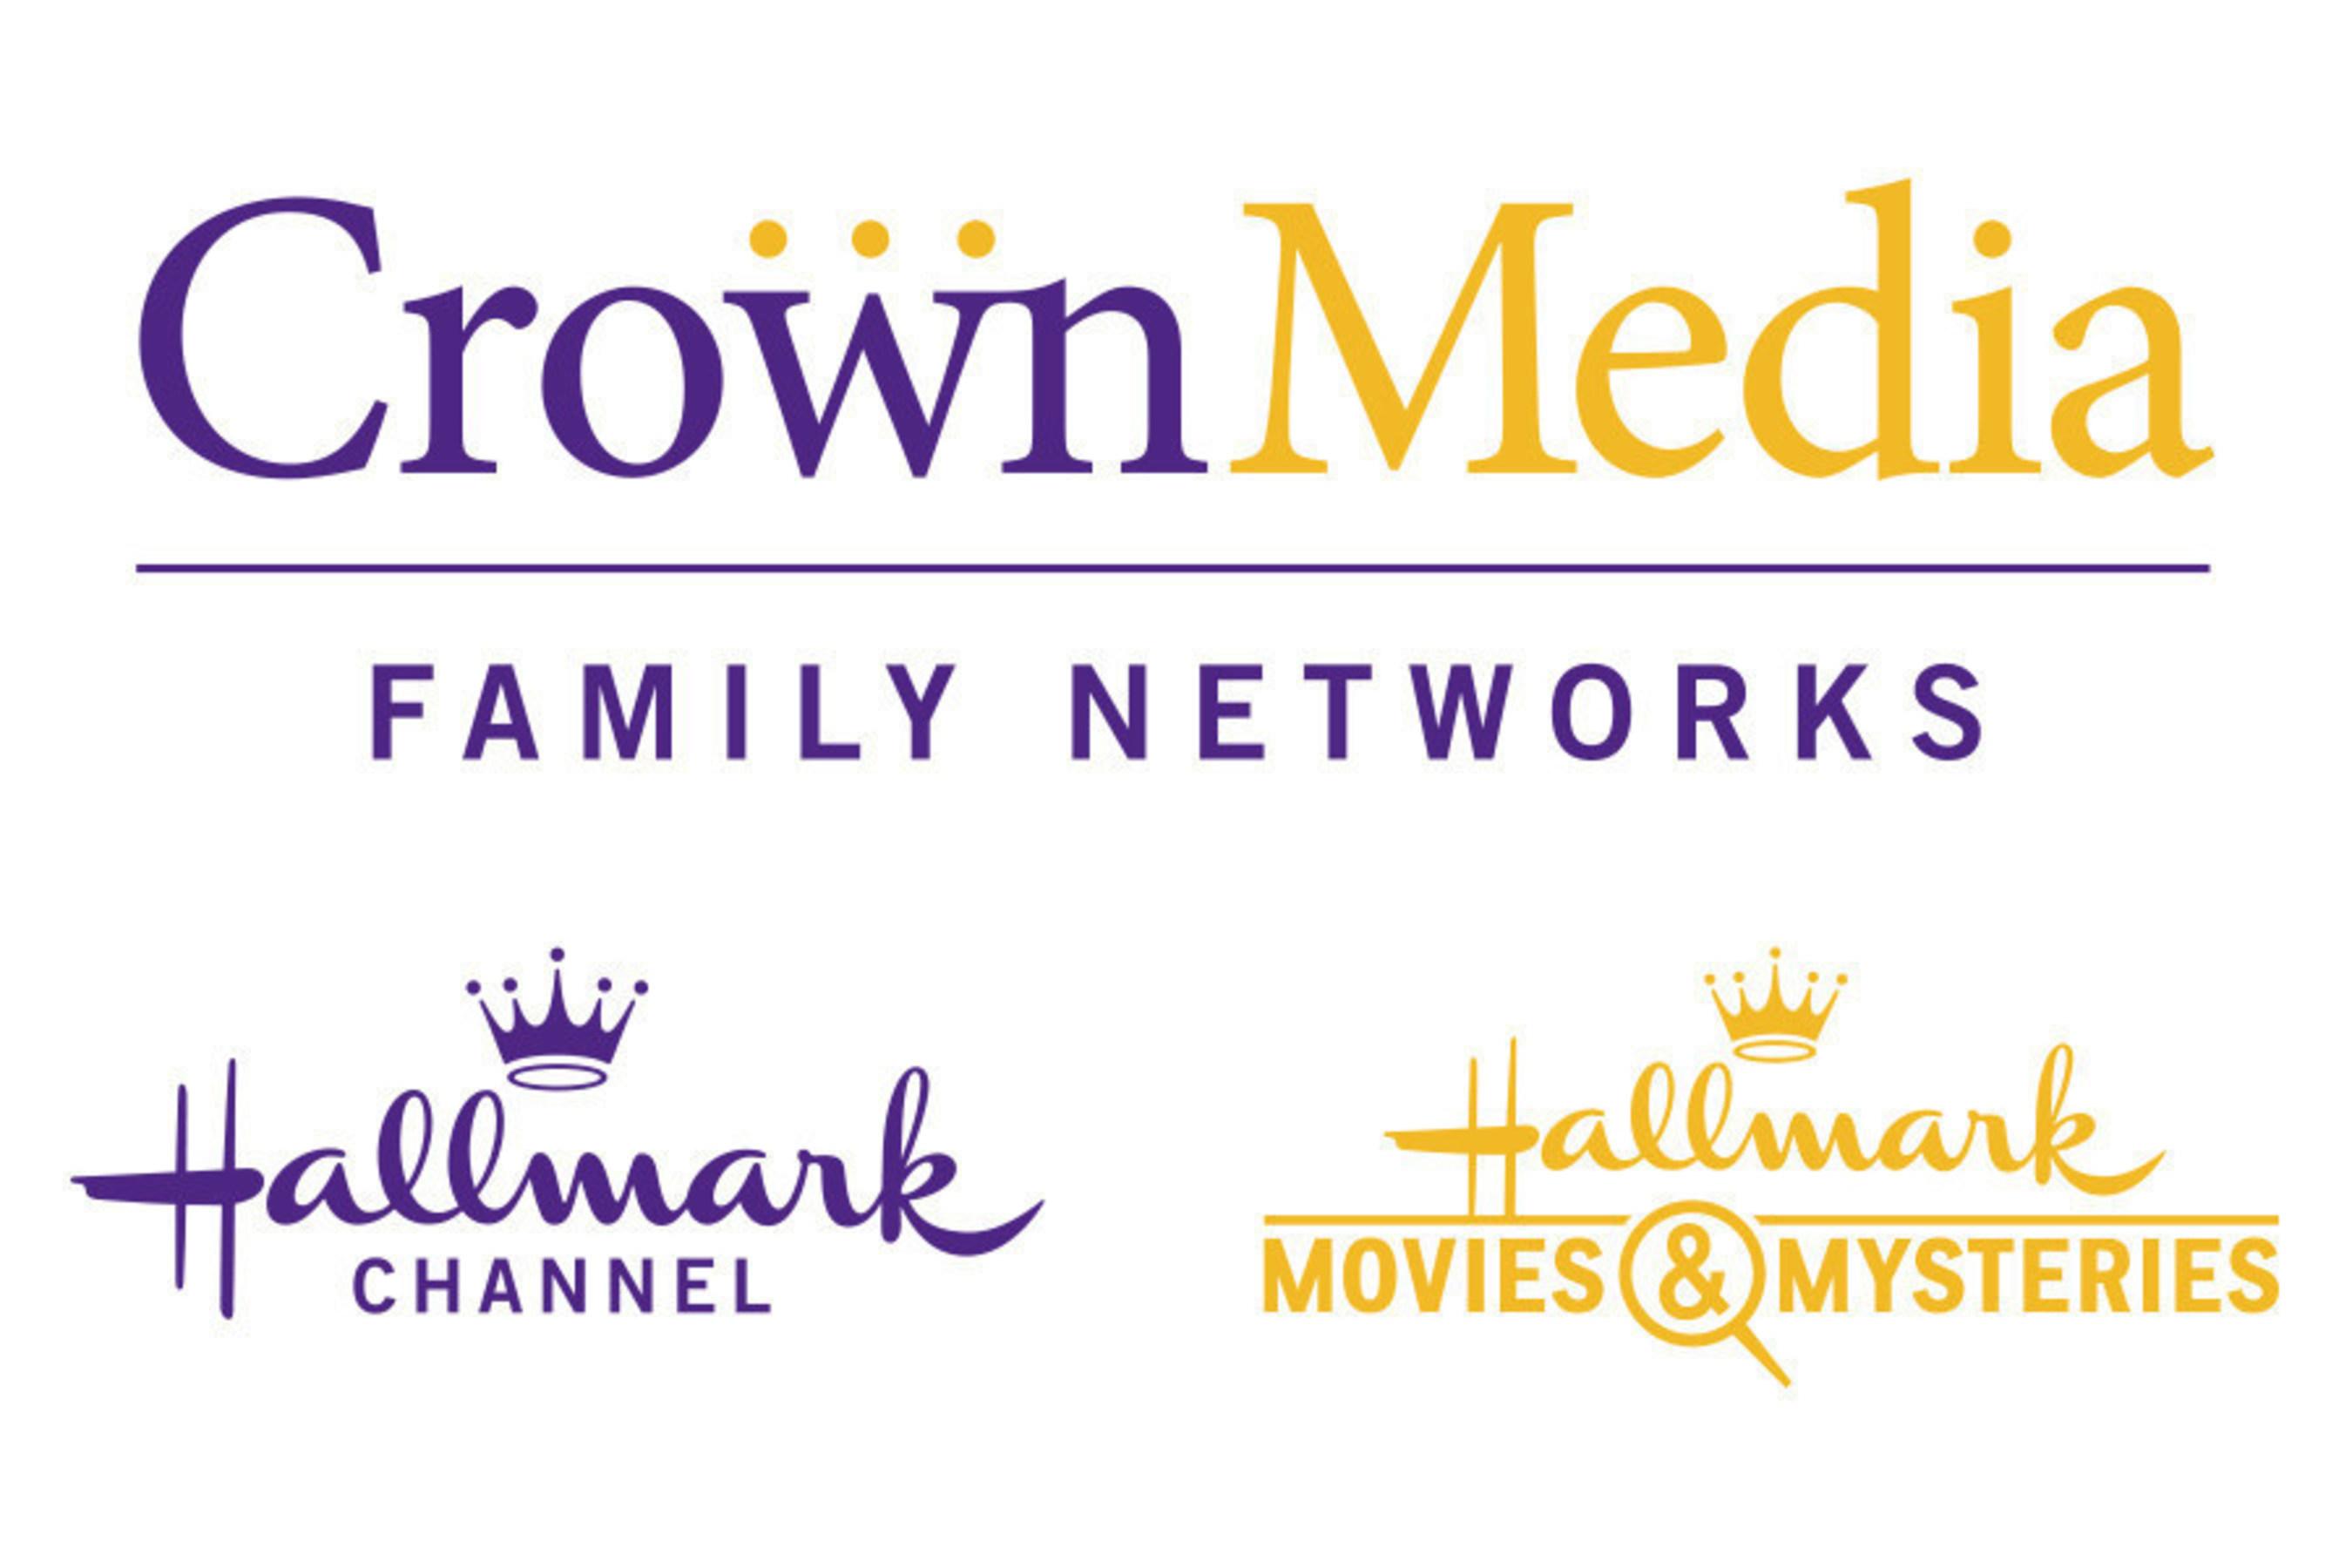 Crown Media Family Networks www.crownmediapress.com